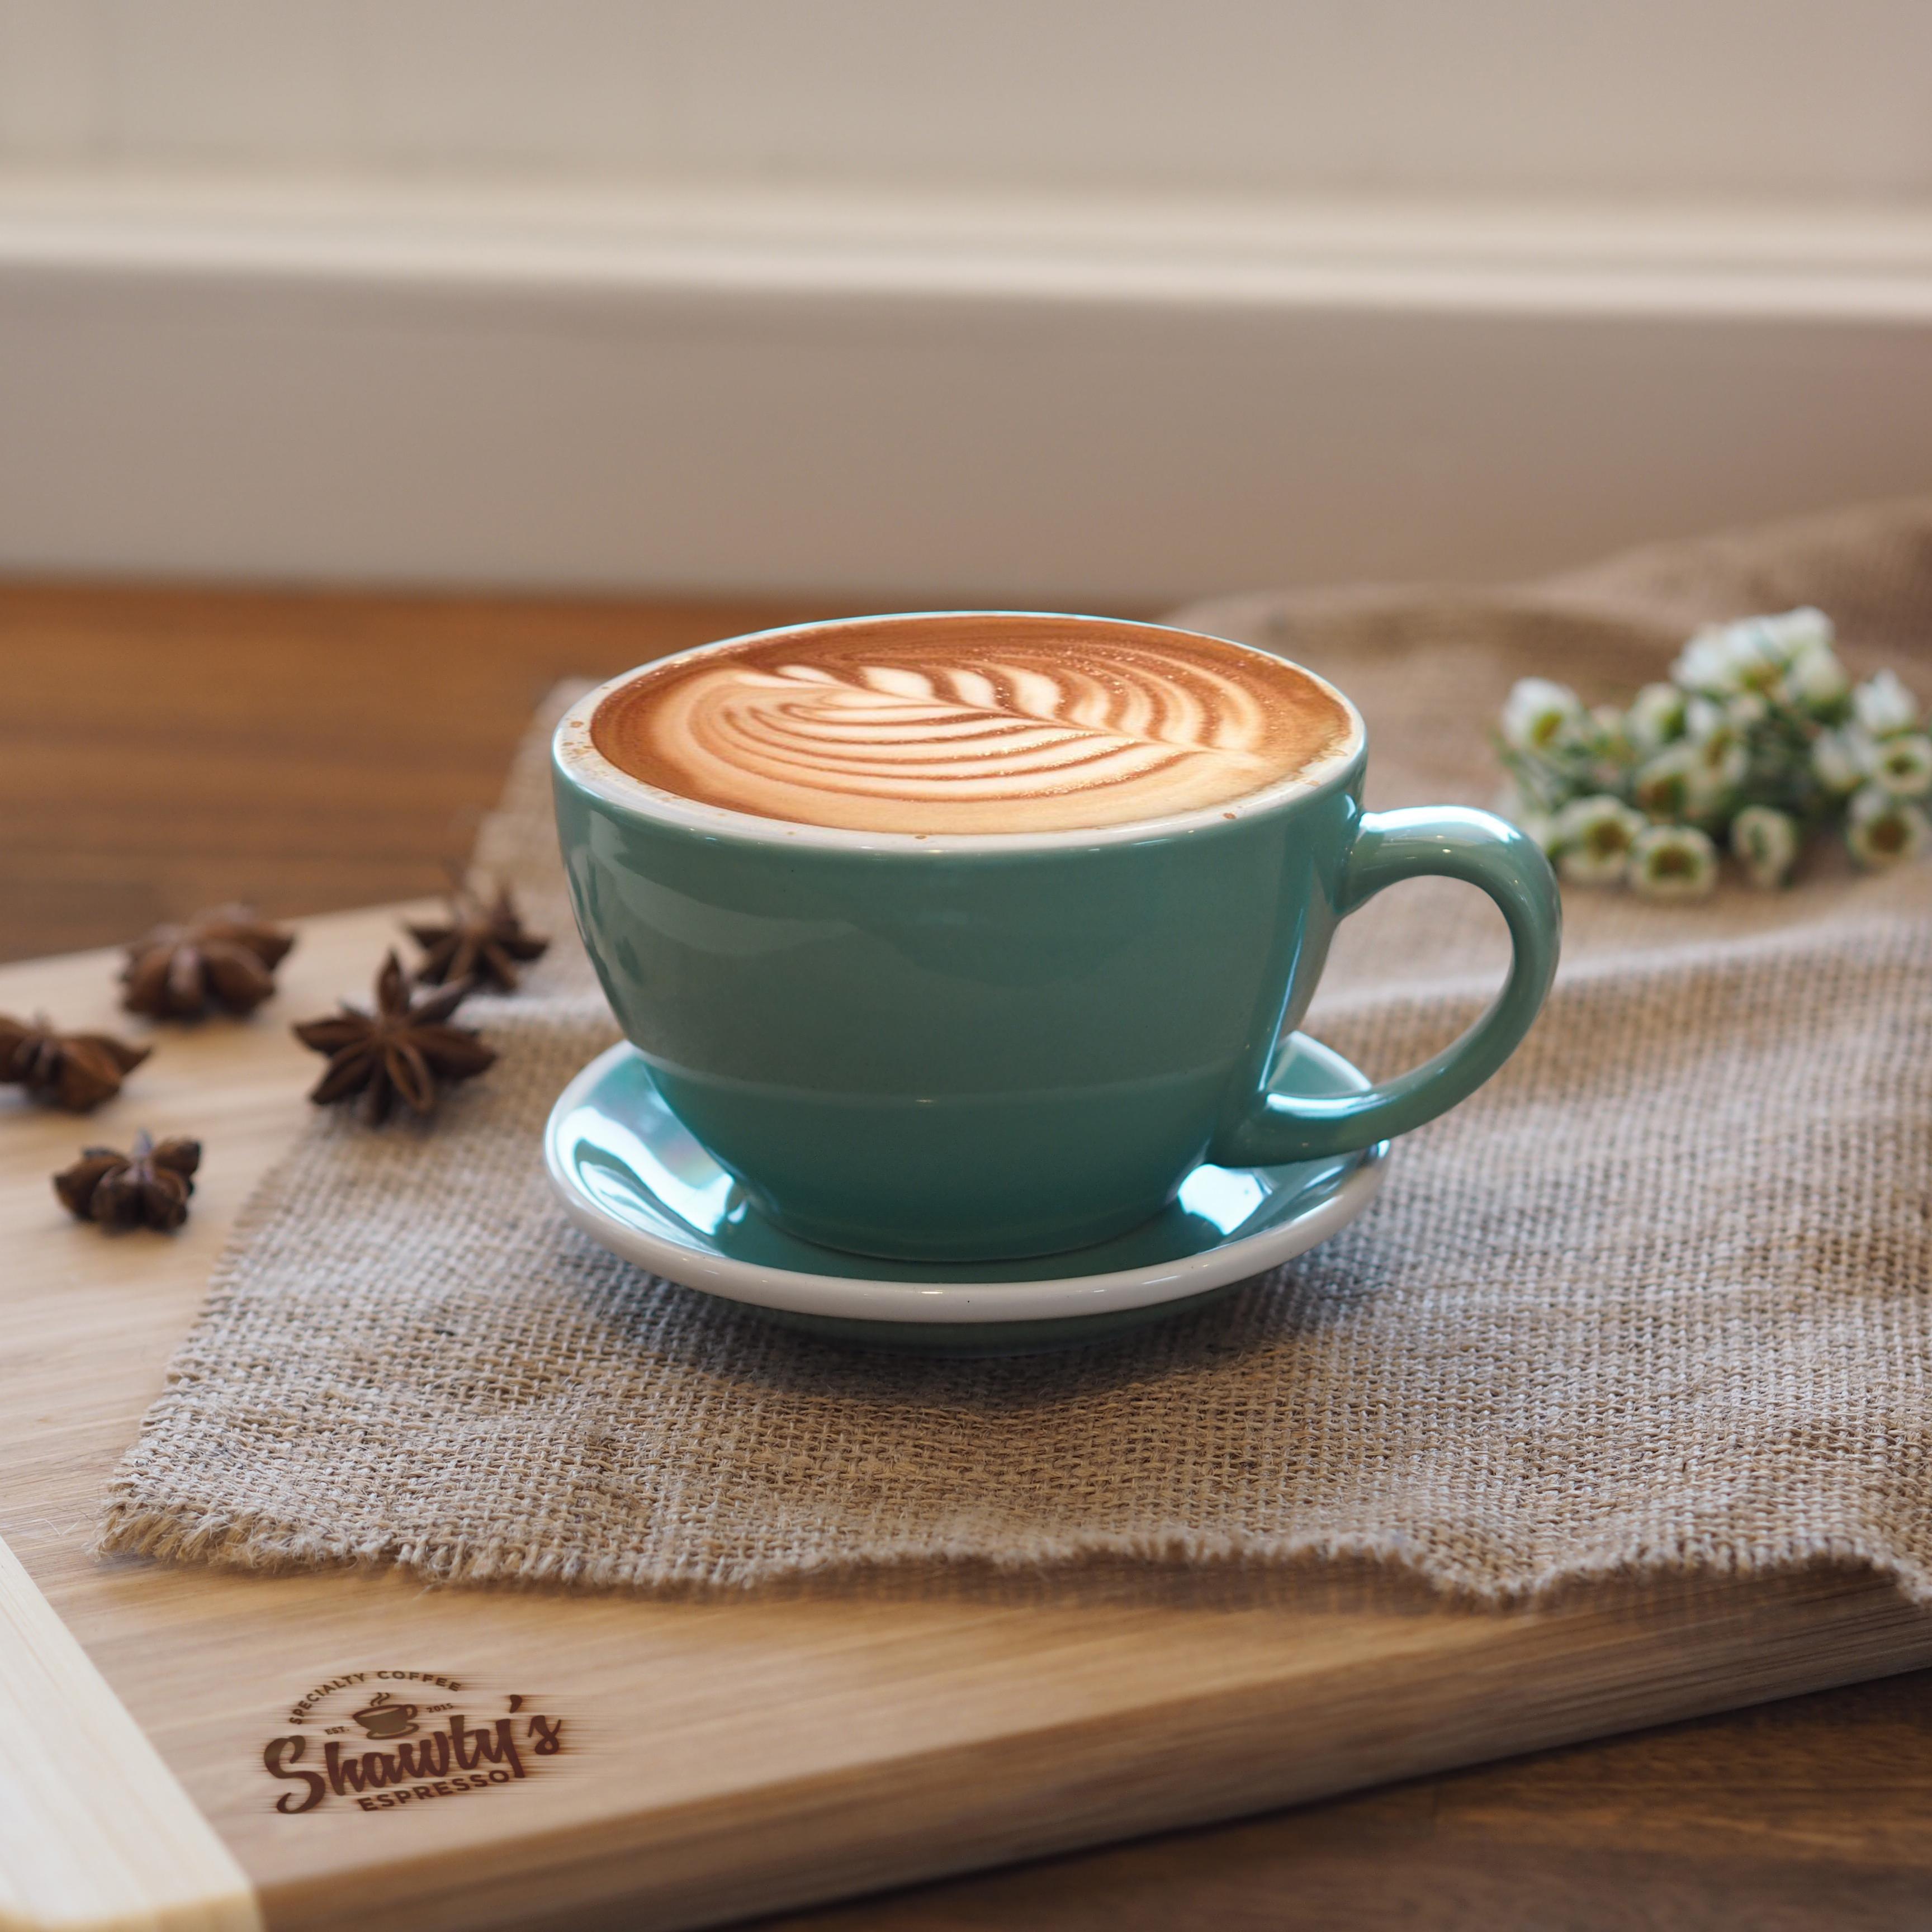 shawtys-espresso-coffee